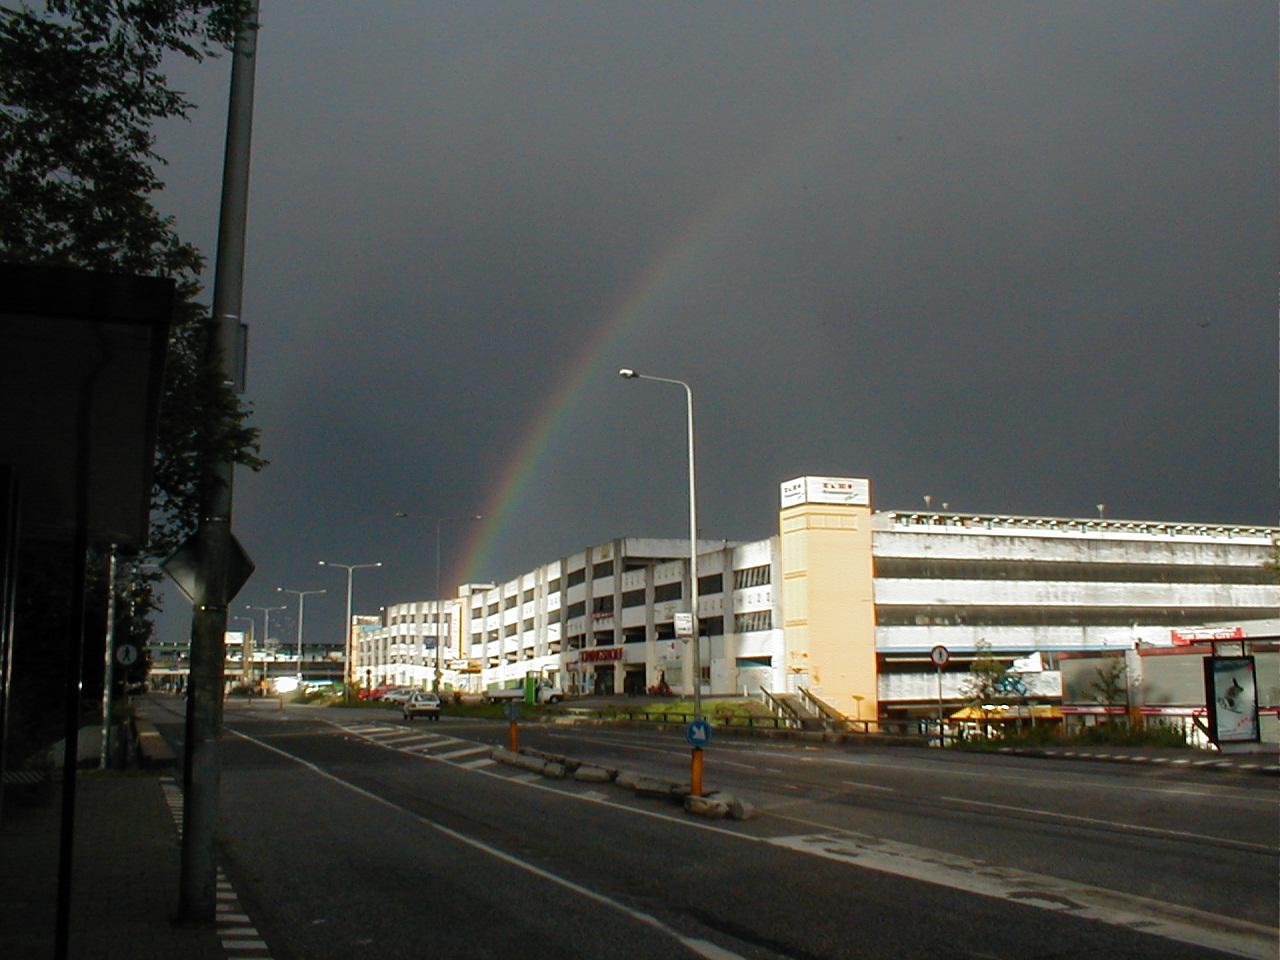 dario rainbow dark sky bad weather highway road building